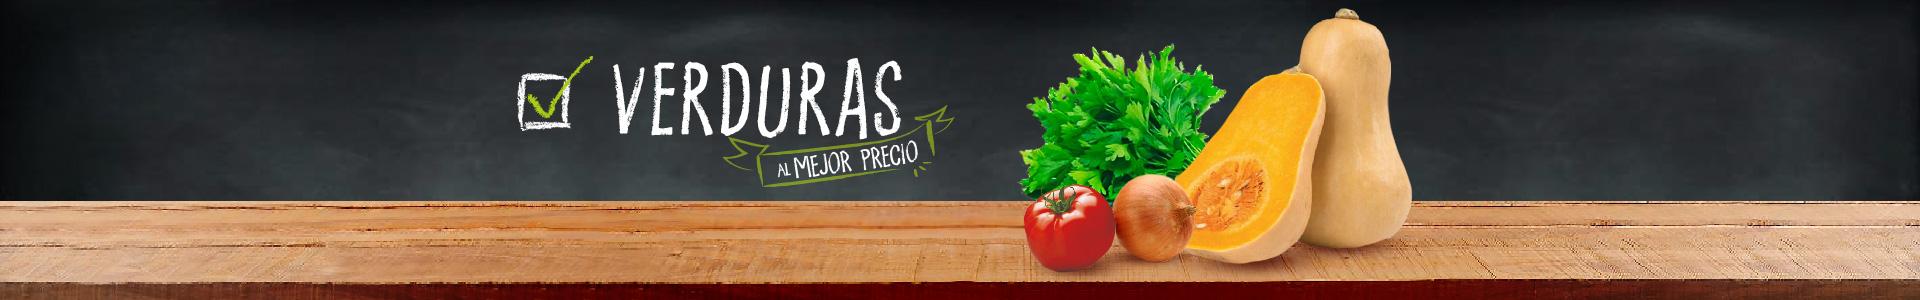 Verduras desktop